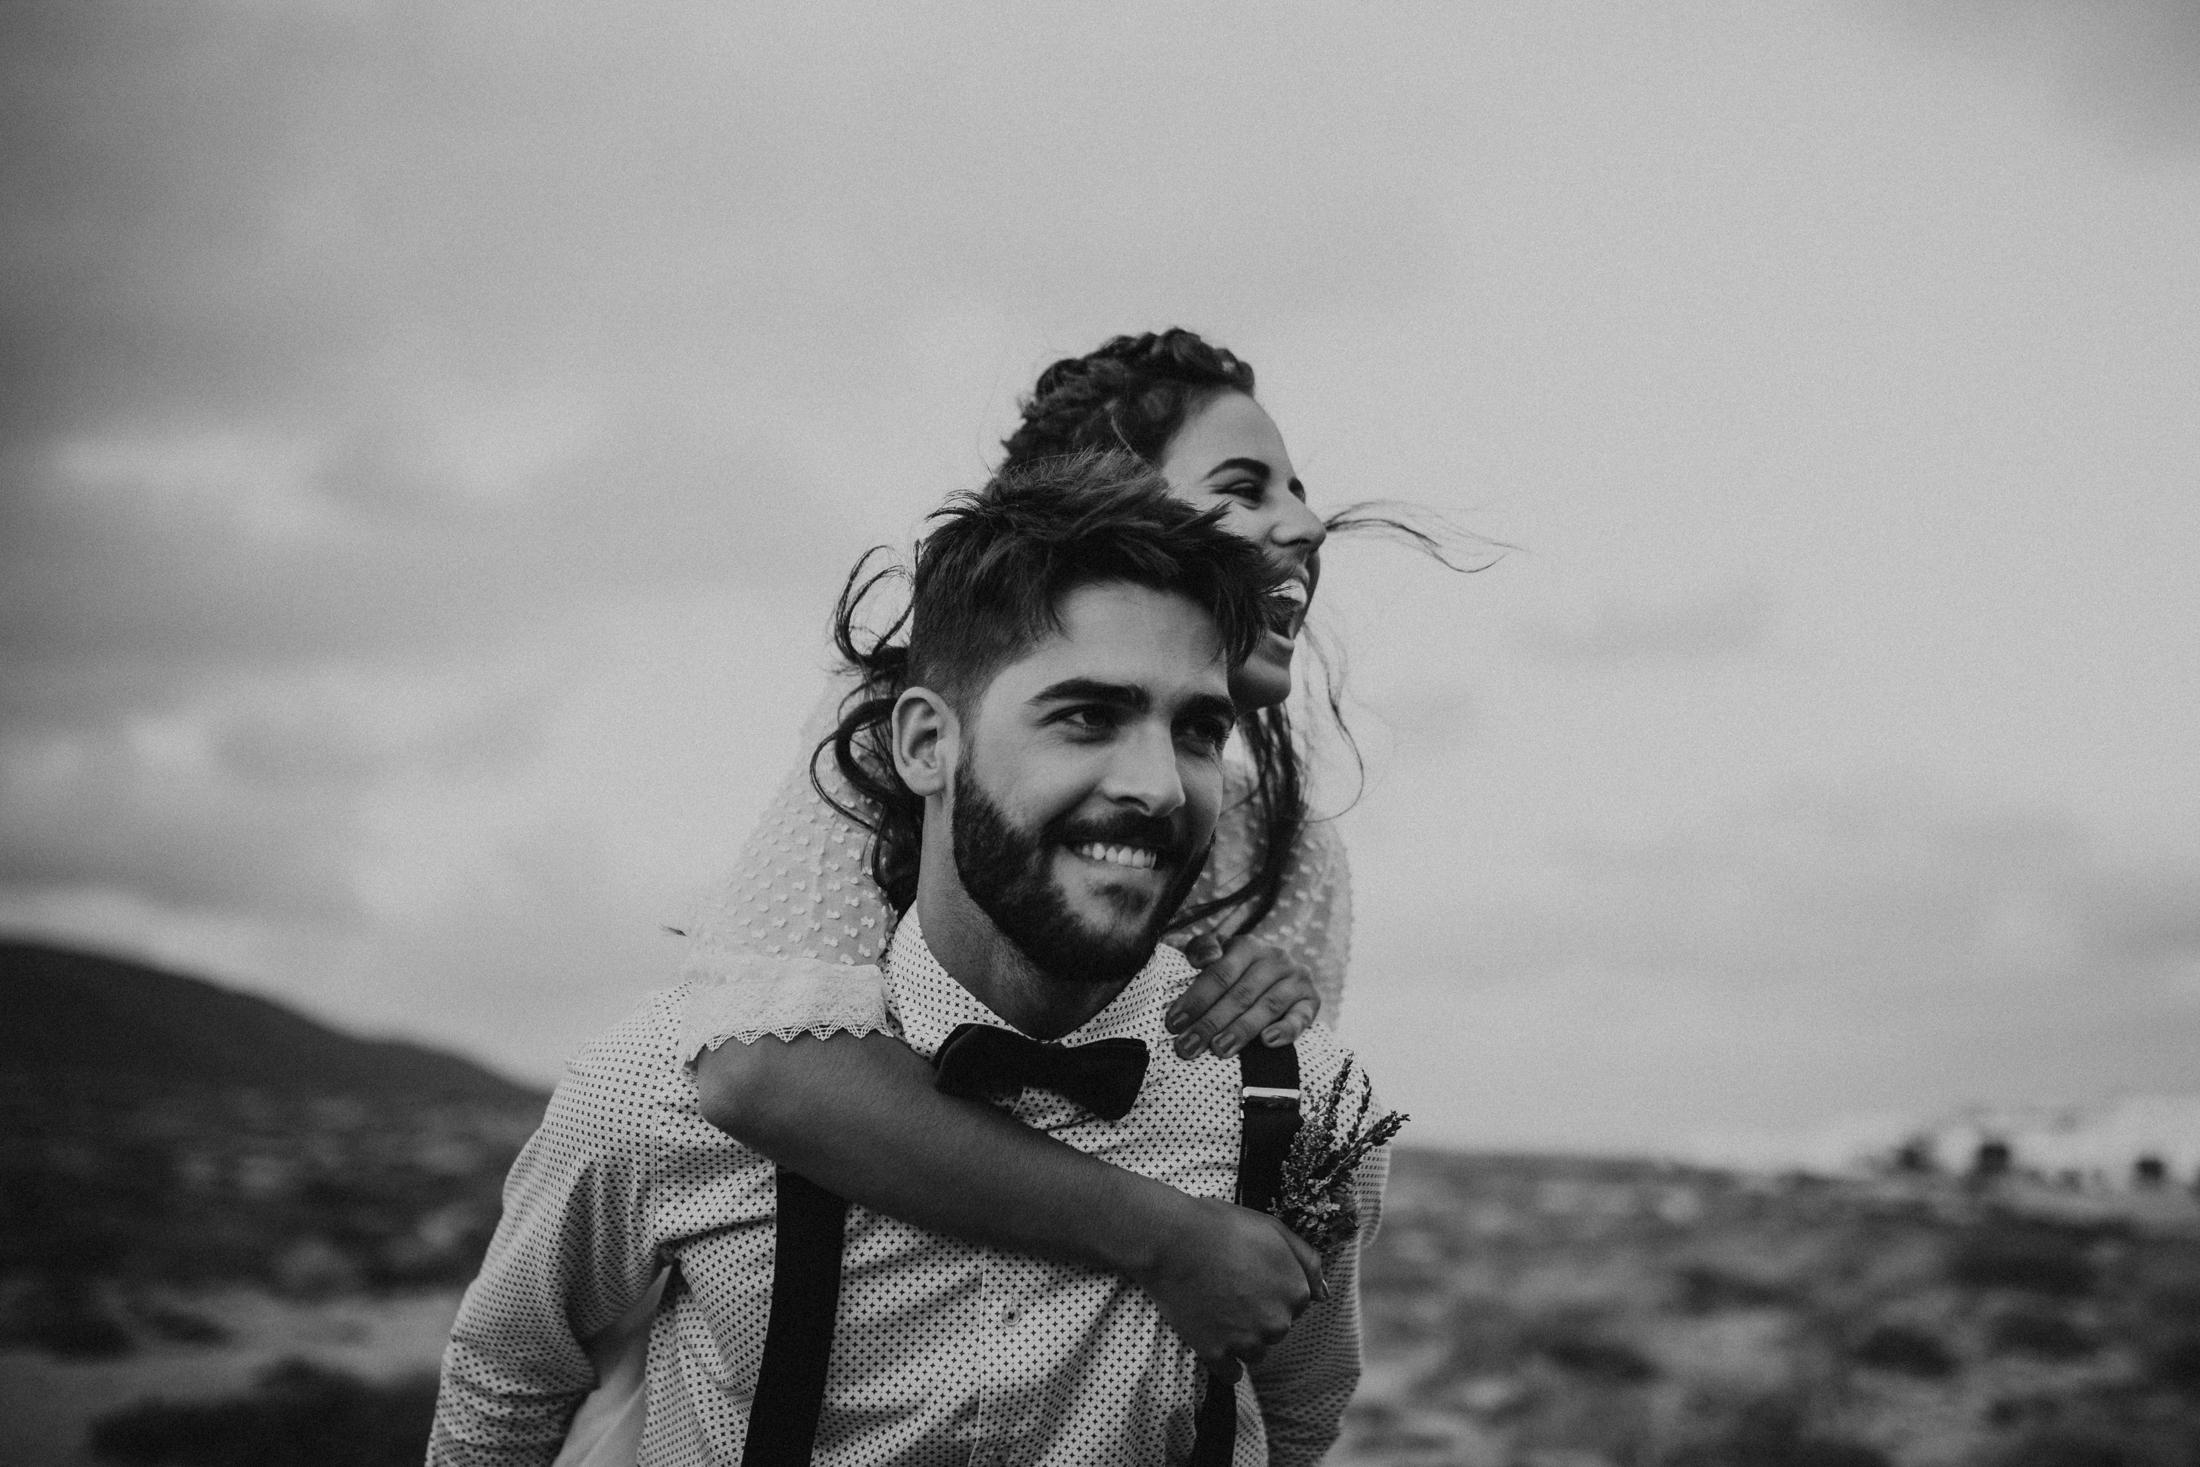 Wedding_Photographer_Mallorca_Daniela-Marquardt_Photography_CanaryIslands_Lanzarote_Iceland_Tuskany_Santorini_Portugal_Schweiz_Austria_Bayern_Elopement_Hochzeitsfotograf_23